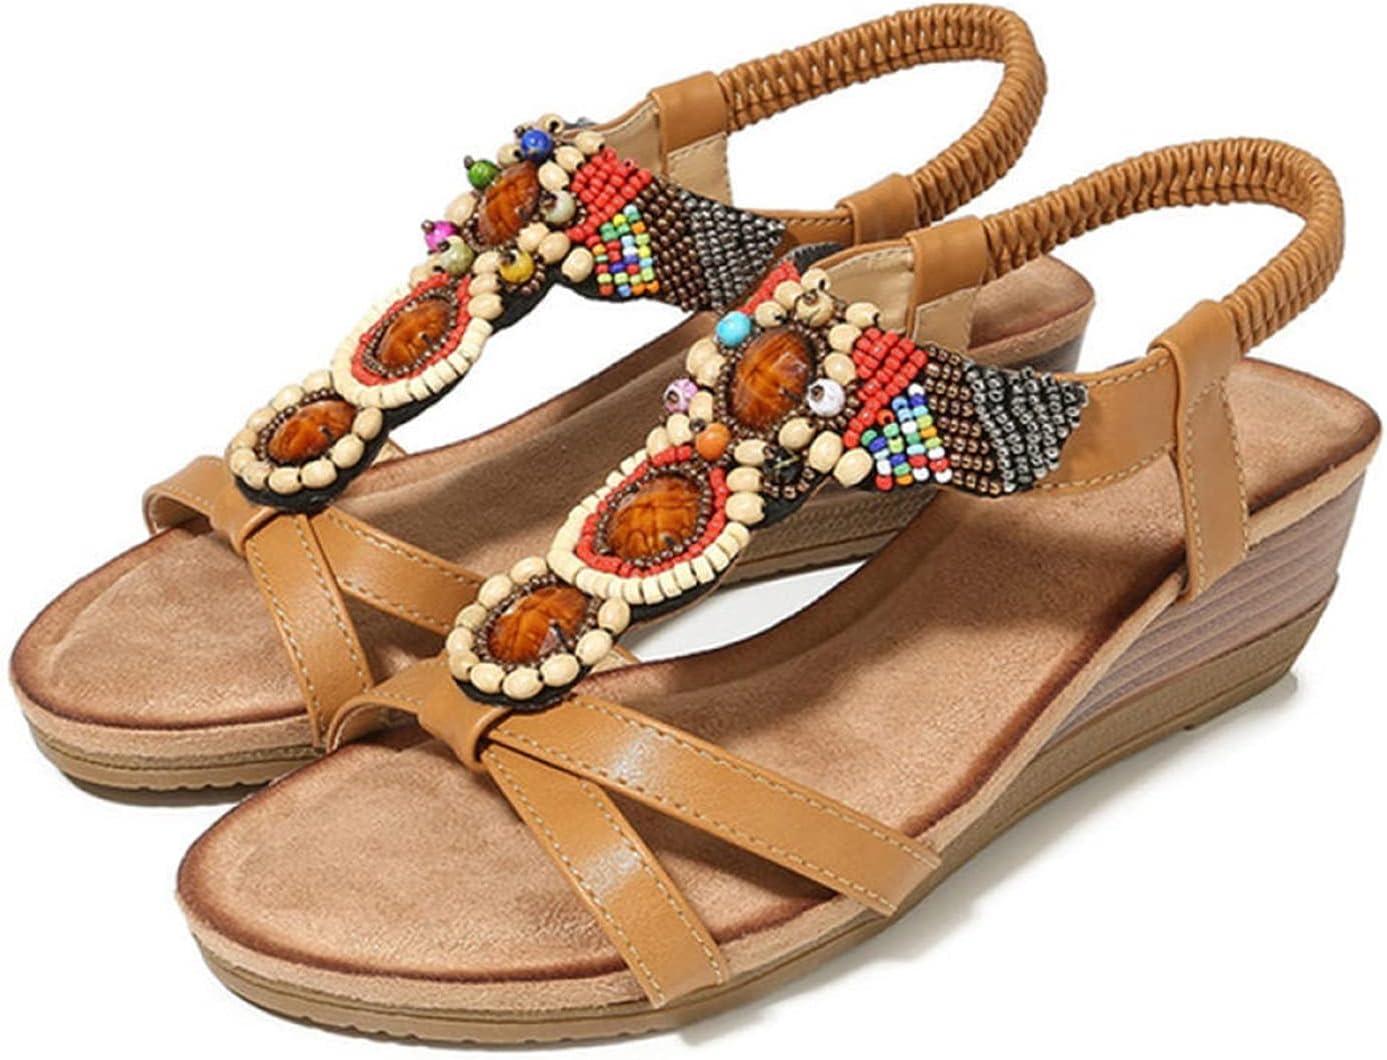 LYNLYN Sandals Comfortable Wedge Sandals Bohemian Ladies Sandals Ladies Sandals (Color : Apricot, Size : 4)